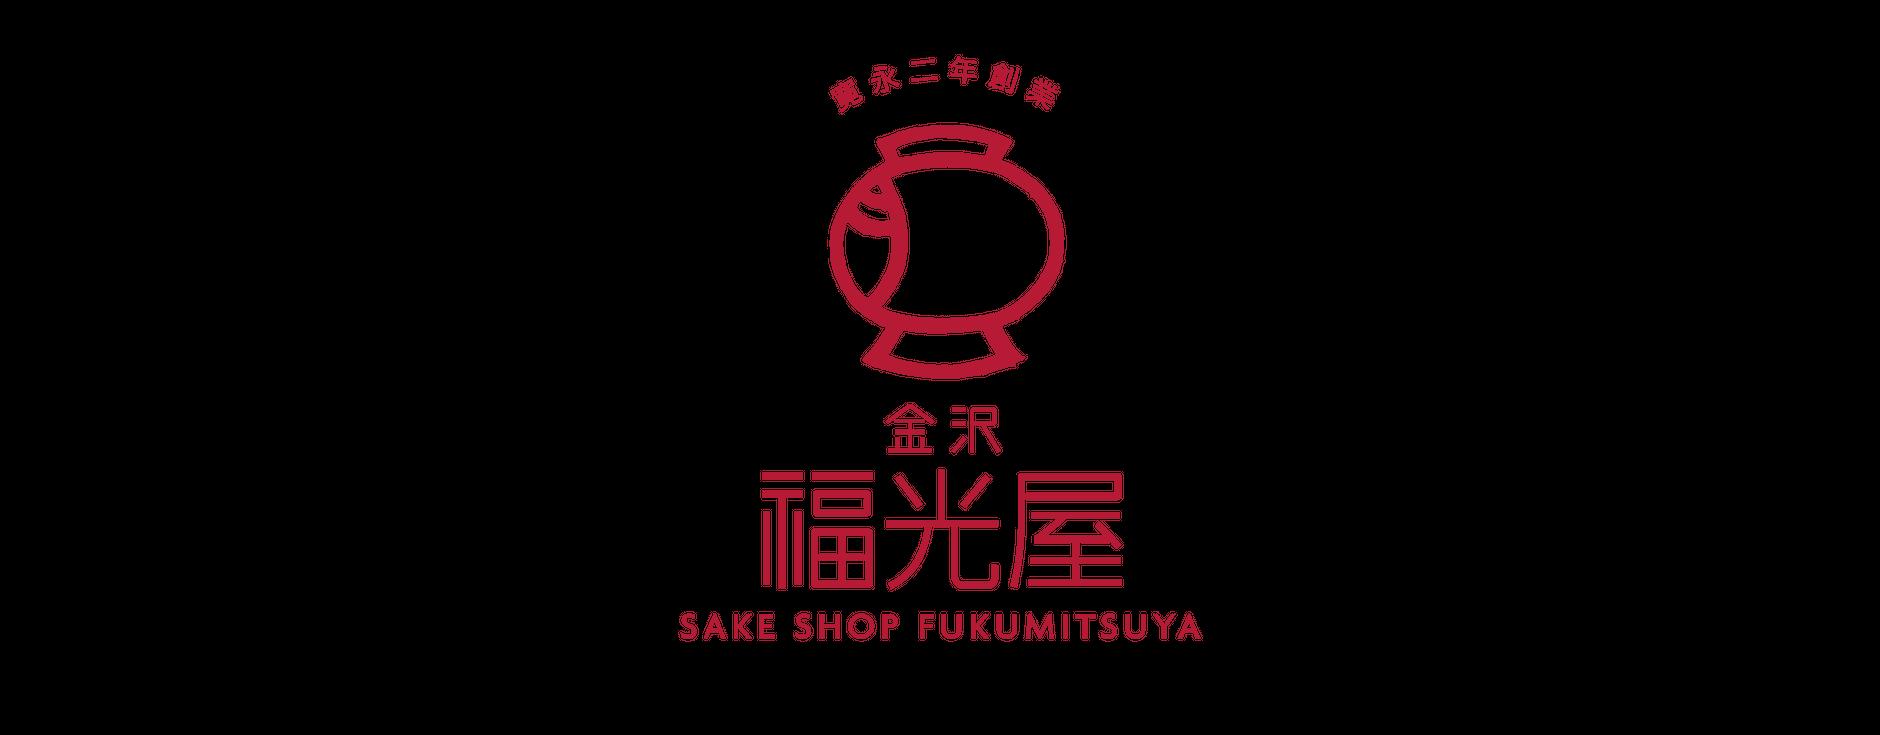 SAKE SHOP 福光屋